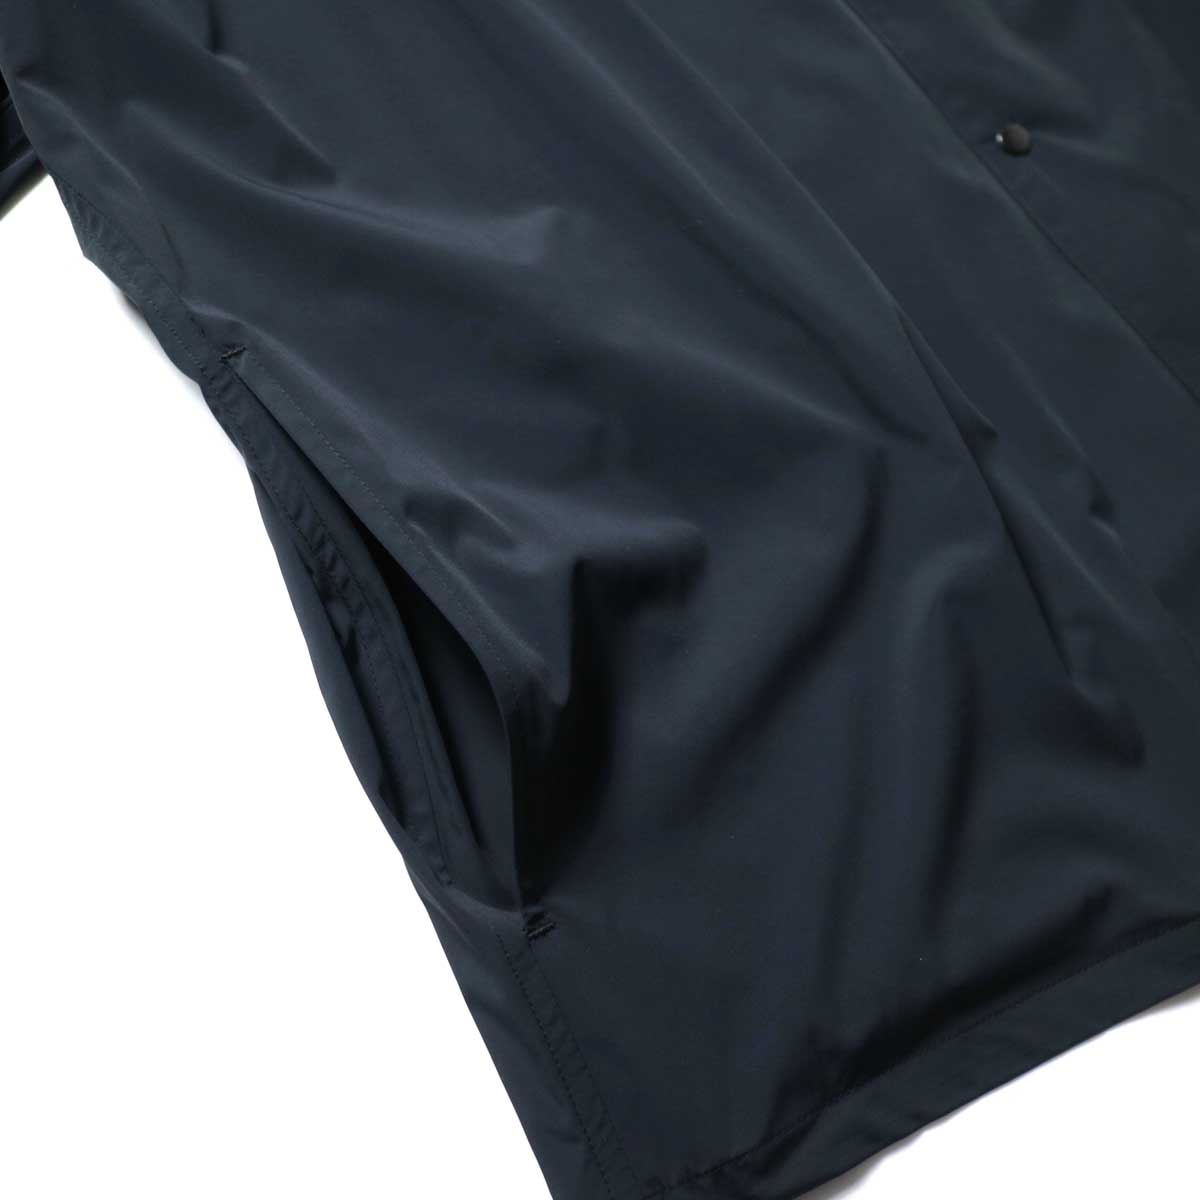 N.HOOLYWOOD / 2211-SH25-006 peg Collarless Shirt (Black)ポケット